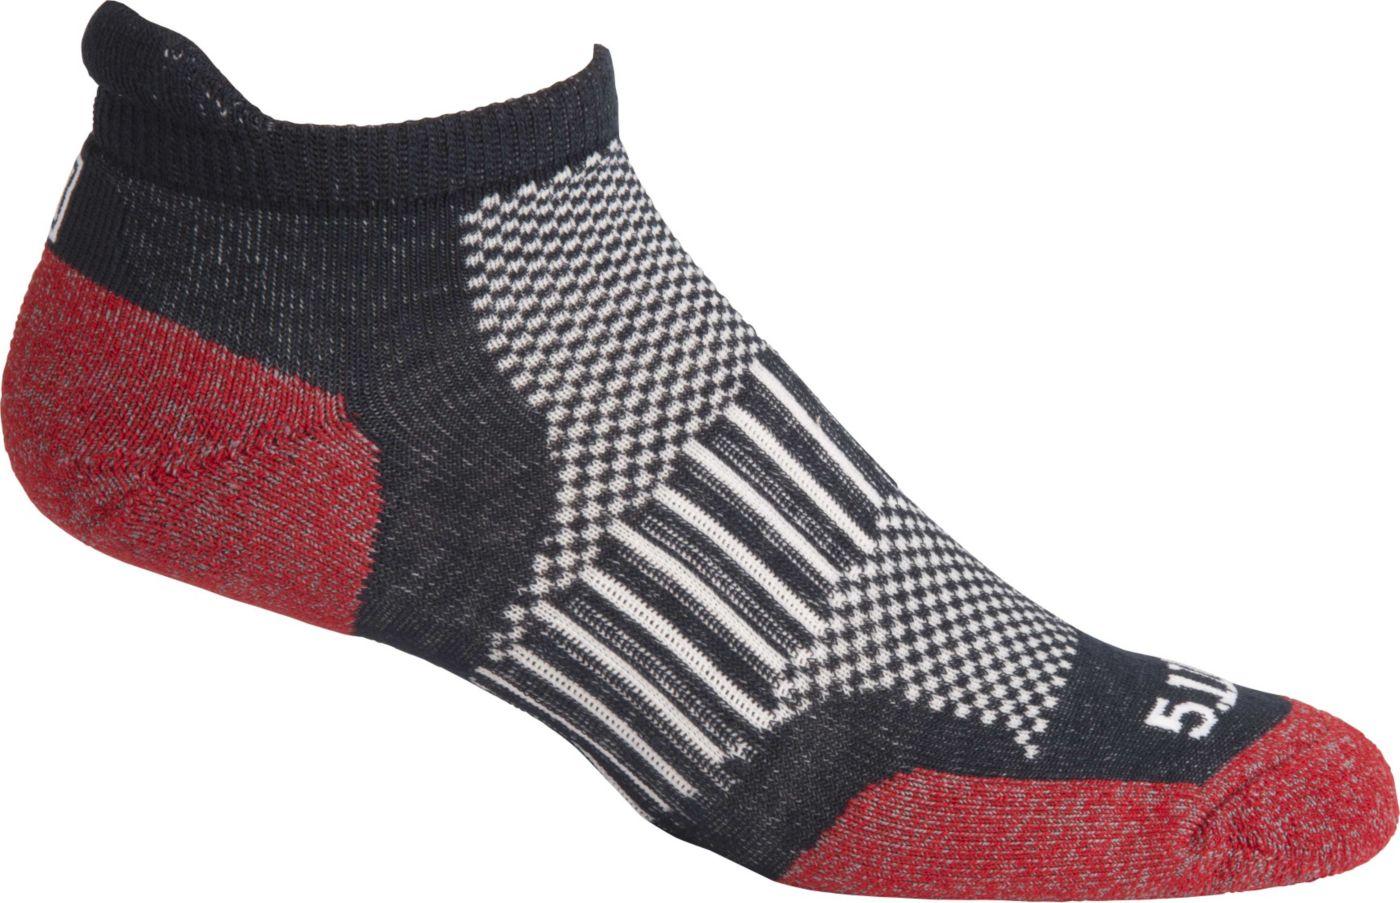 5.11 Tactical ABT Training Low Cut Socks